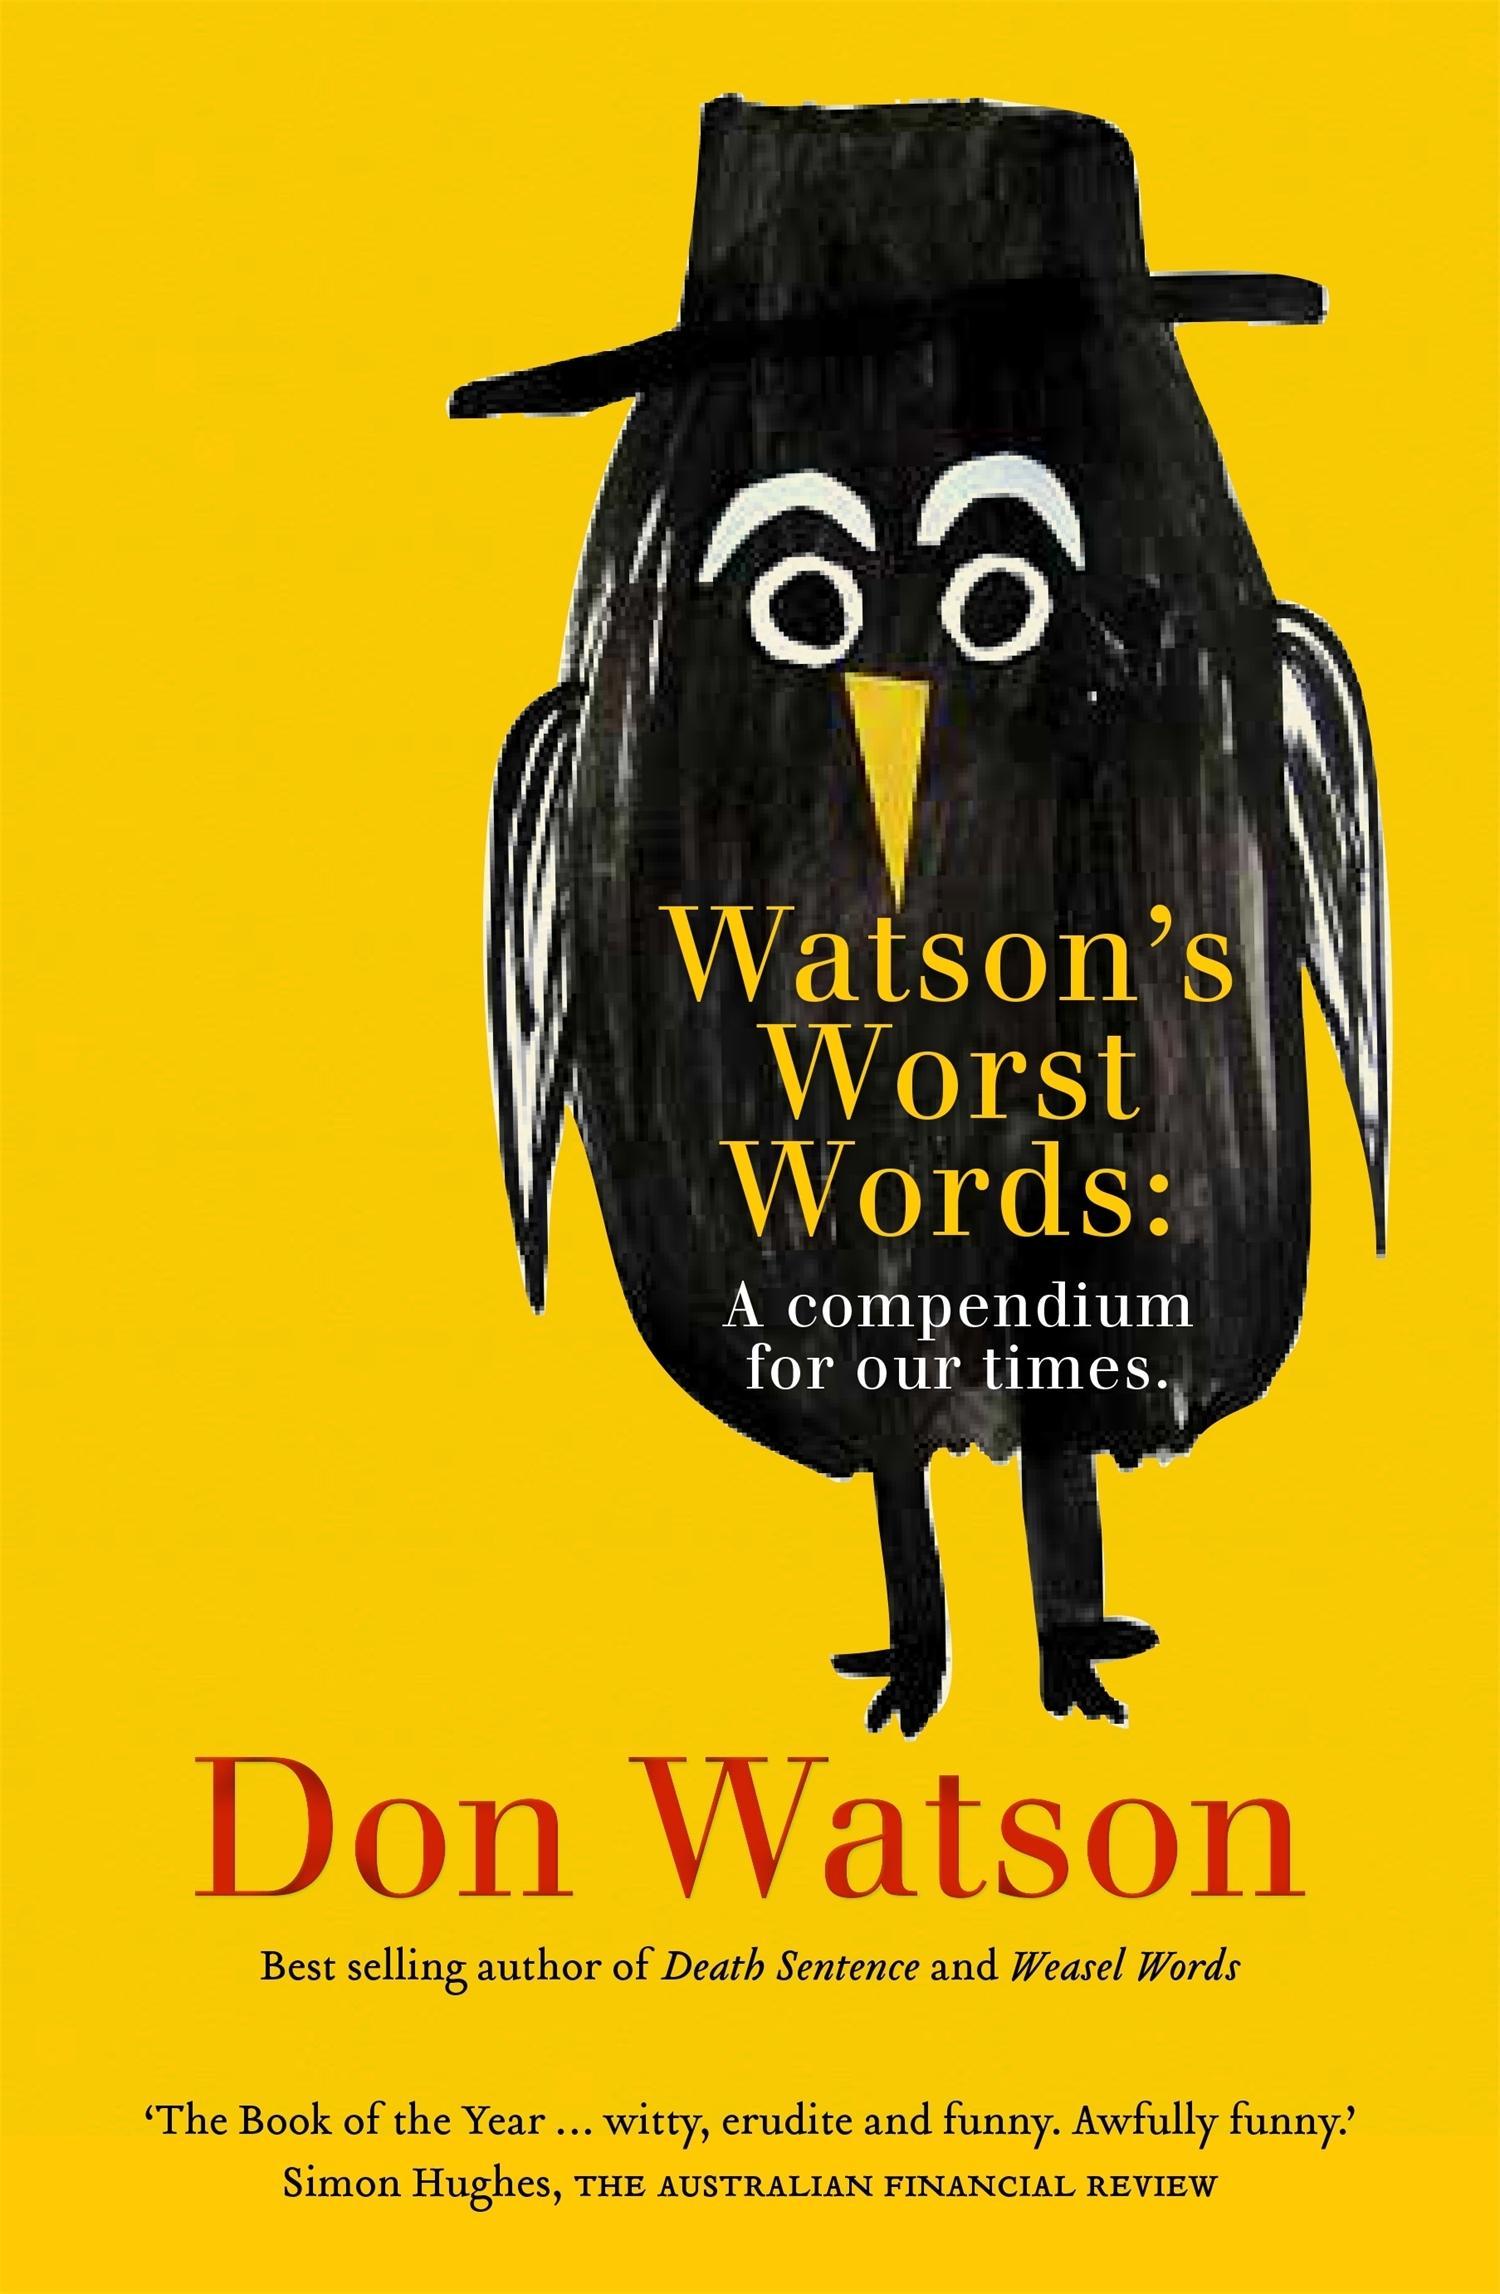 Watson's Worst Words: A Compendium of ManagementGibberish